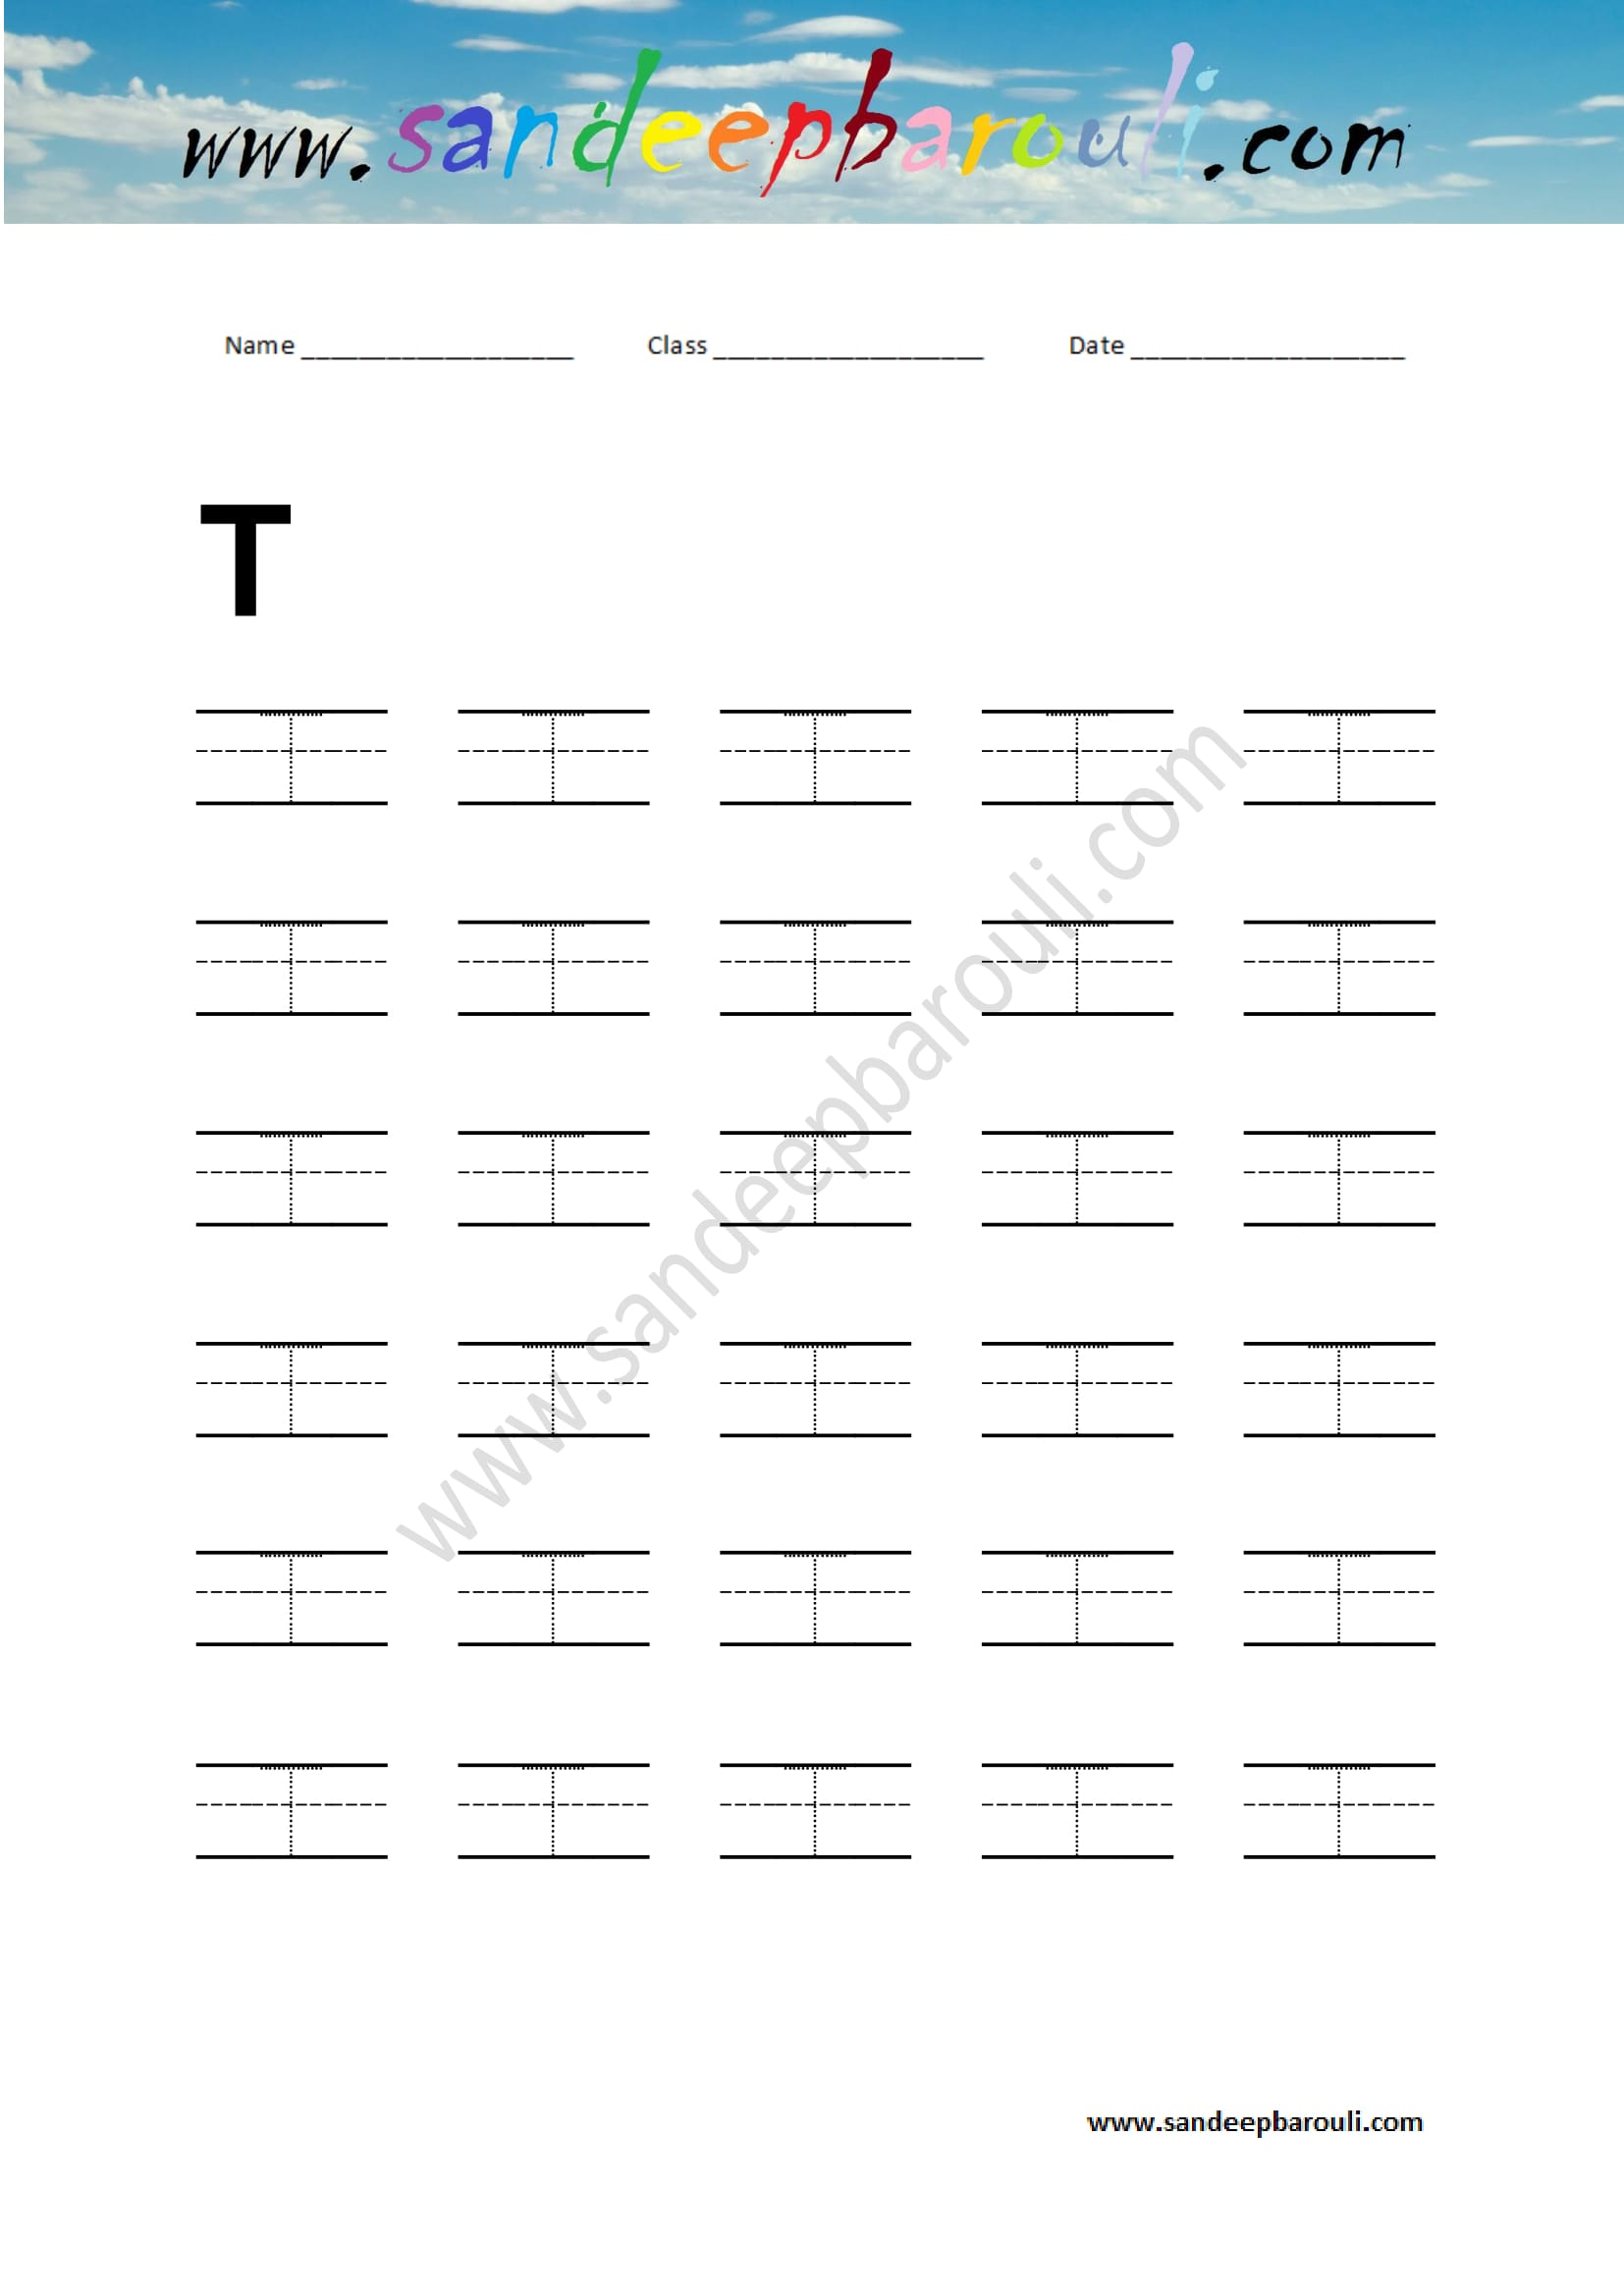 Handwriting Practice Letter T Sandeepbarouli